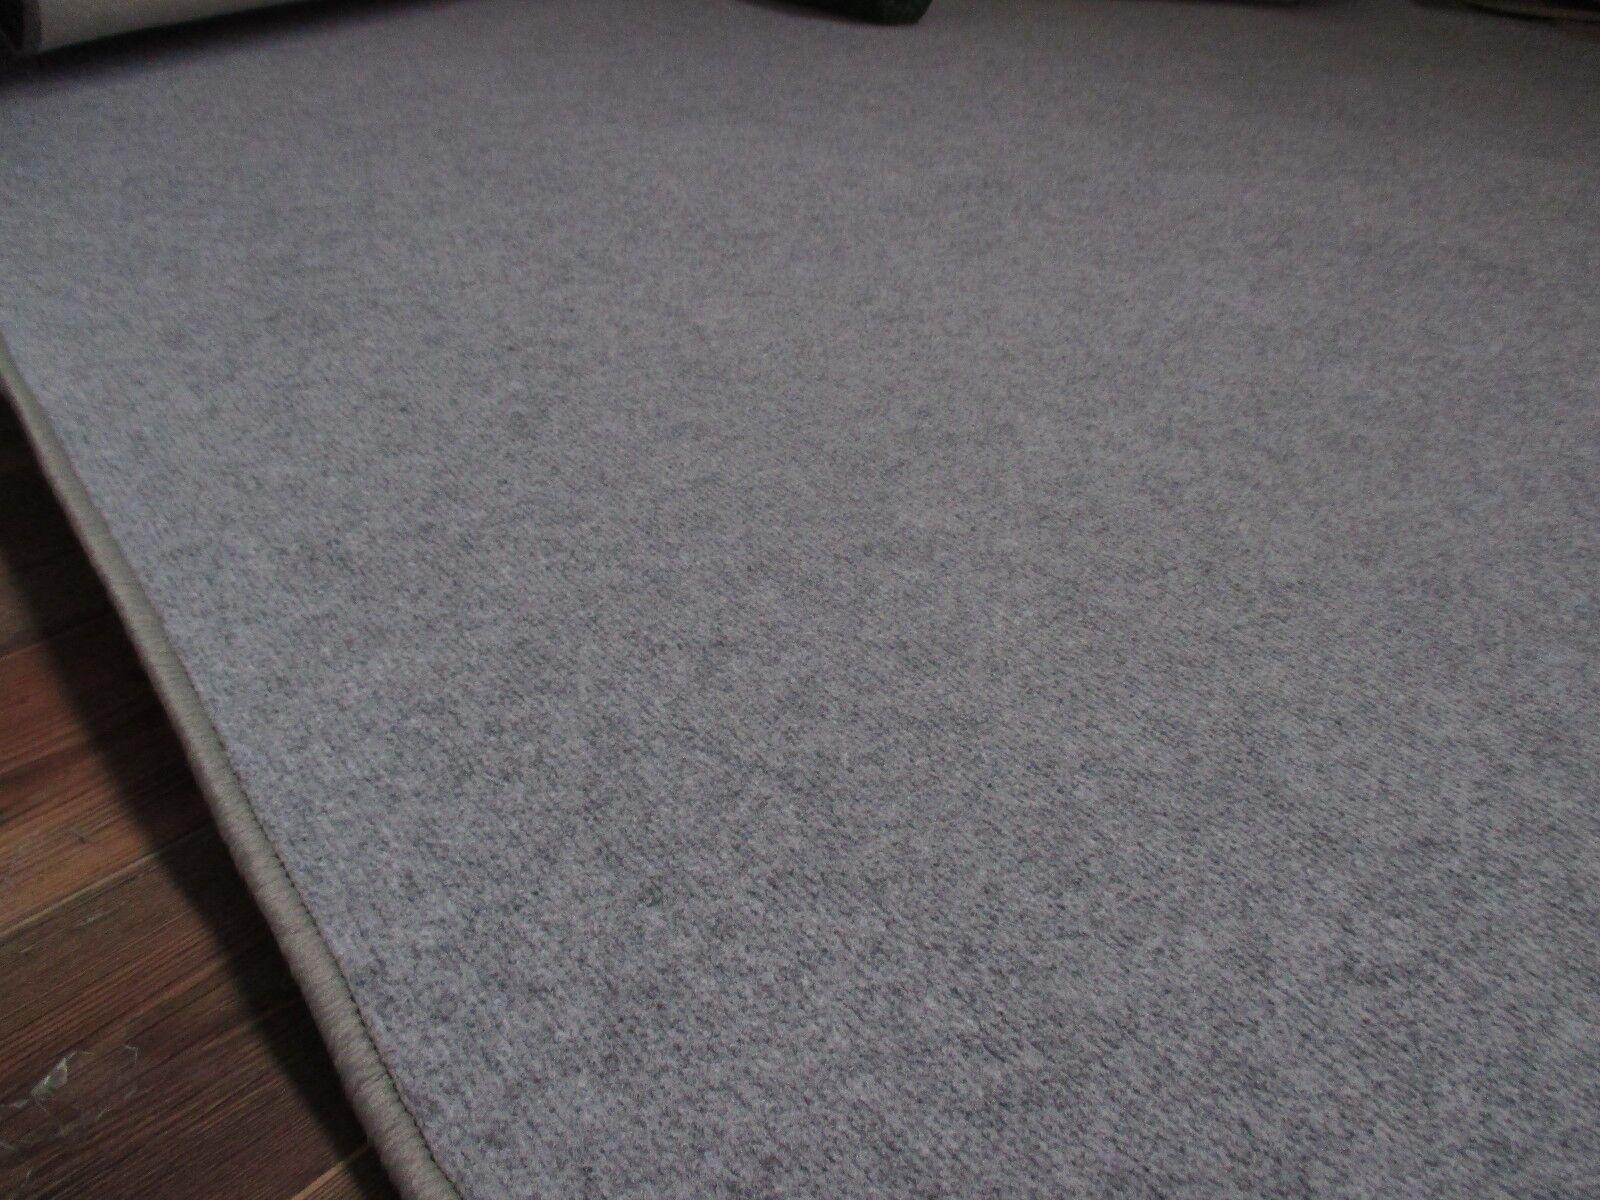 Teppich Basic uni grau grau grau 200 x 300 cm NEU 487981